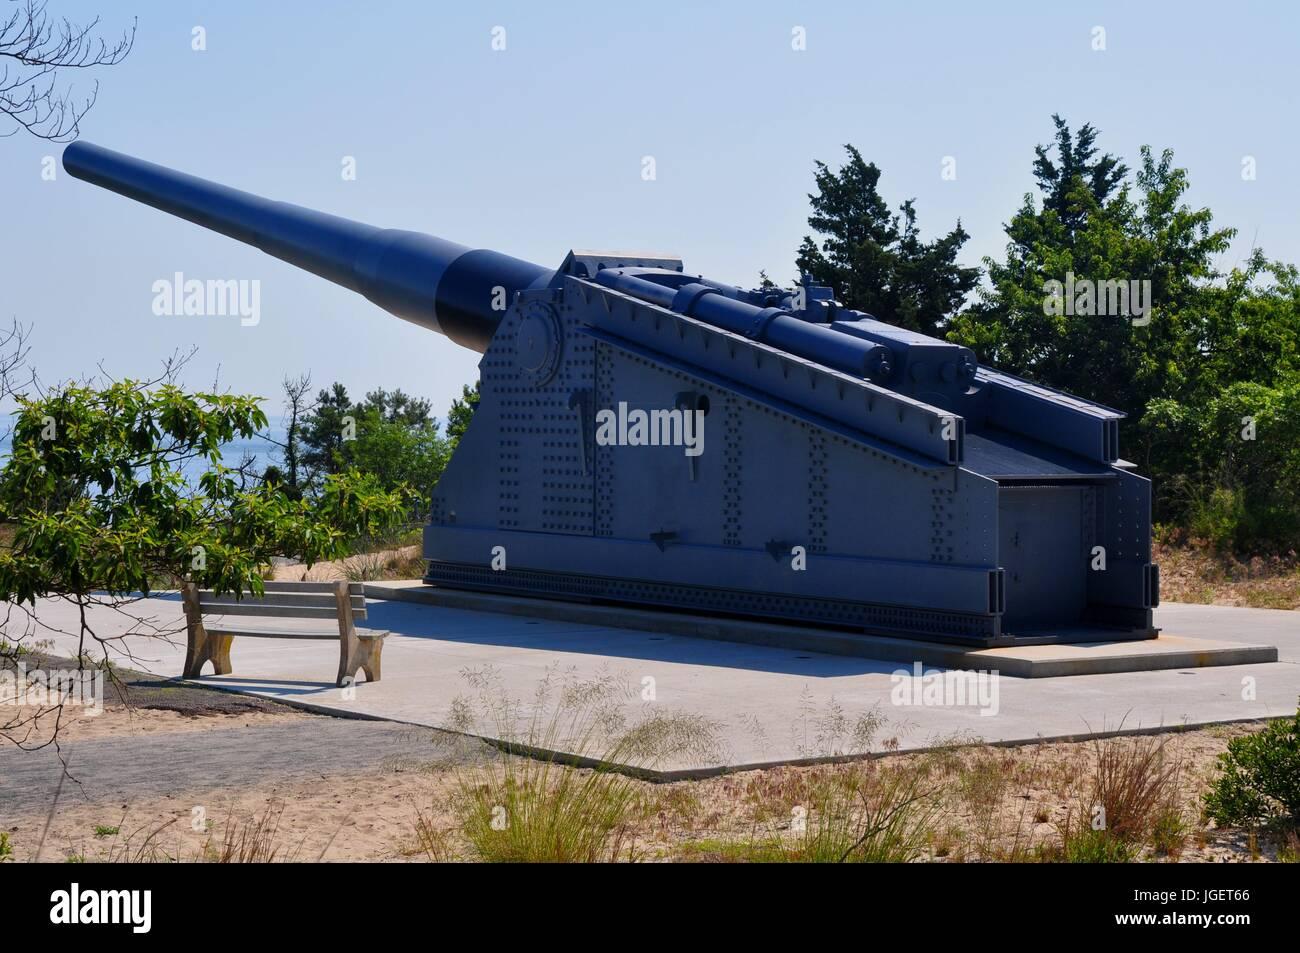 16 Inch Gun - A Coastal Defense Giant - Stock Image